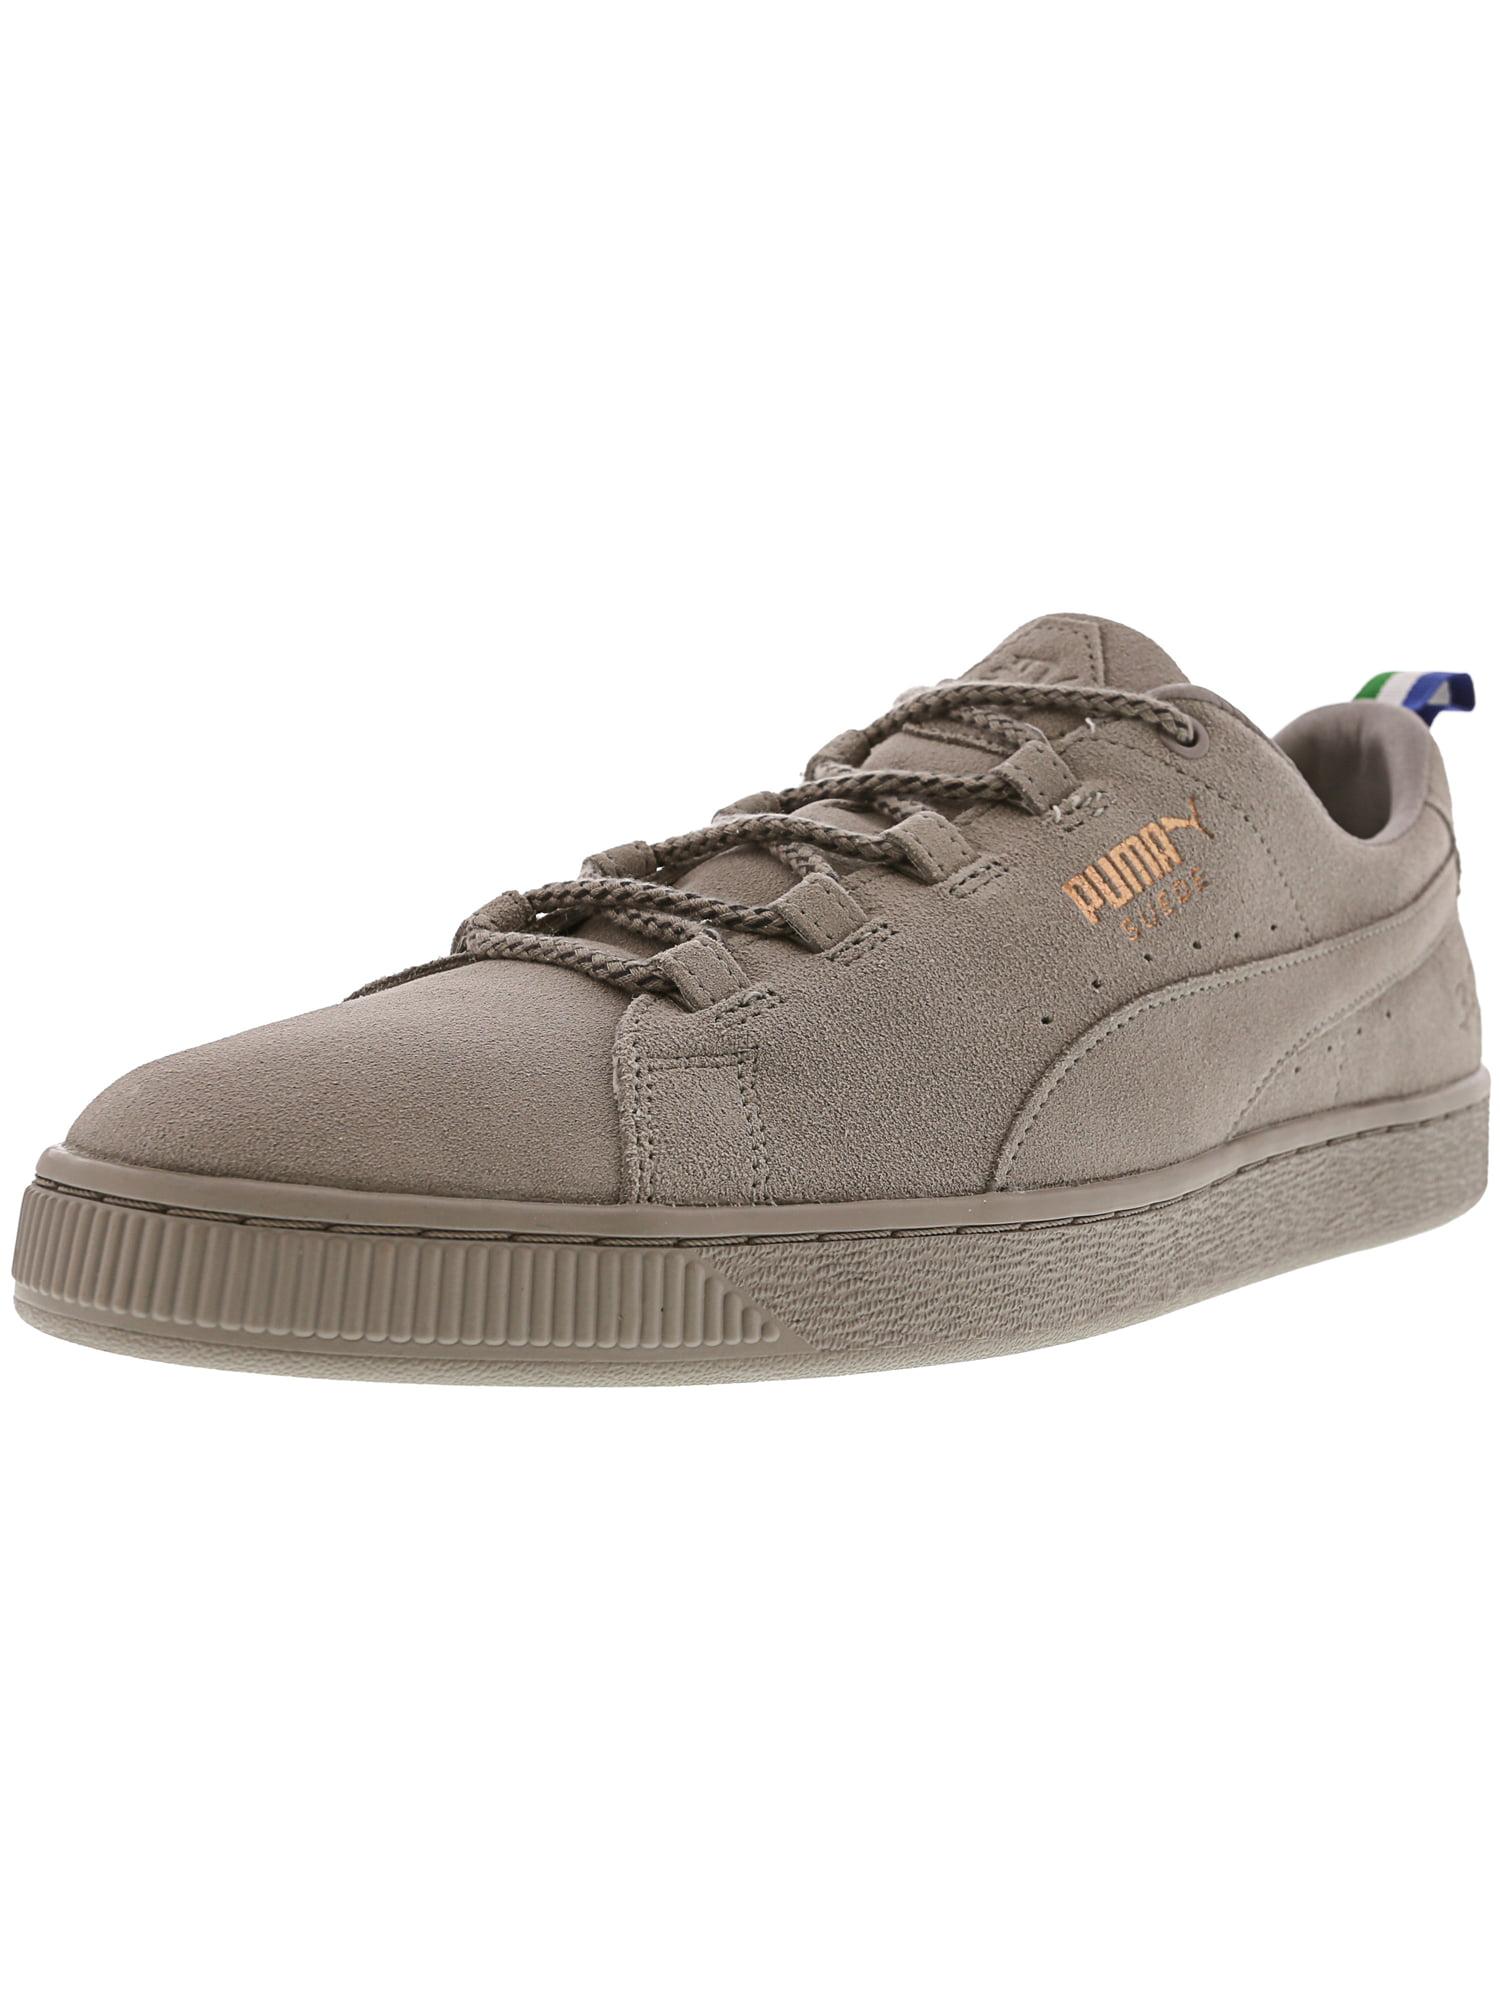 Puma Men's Suede Big Sean Ash / Ankle-High Fashion Sneaker - 11.5M